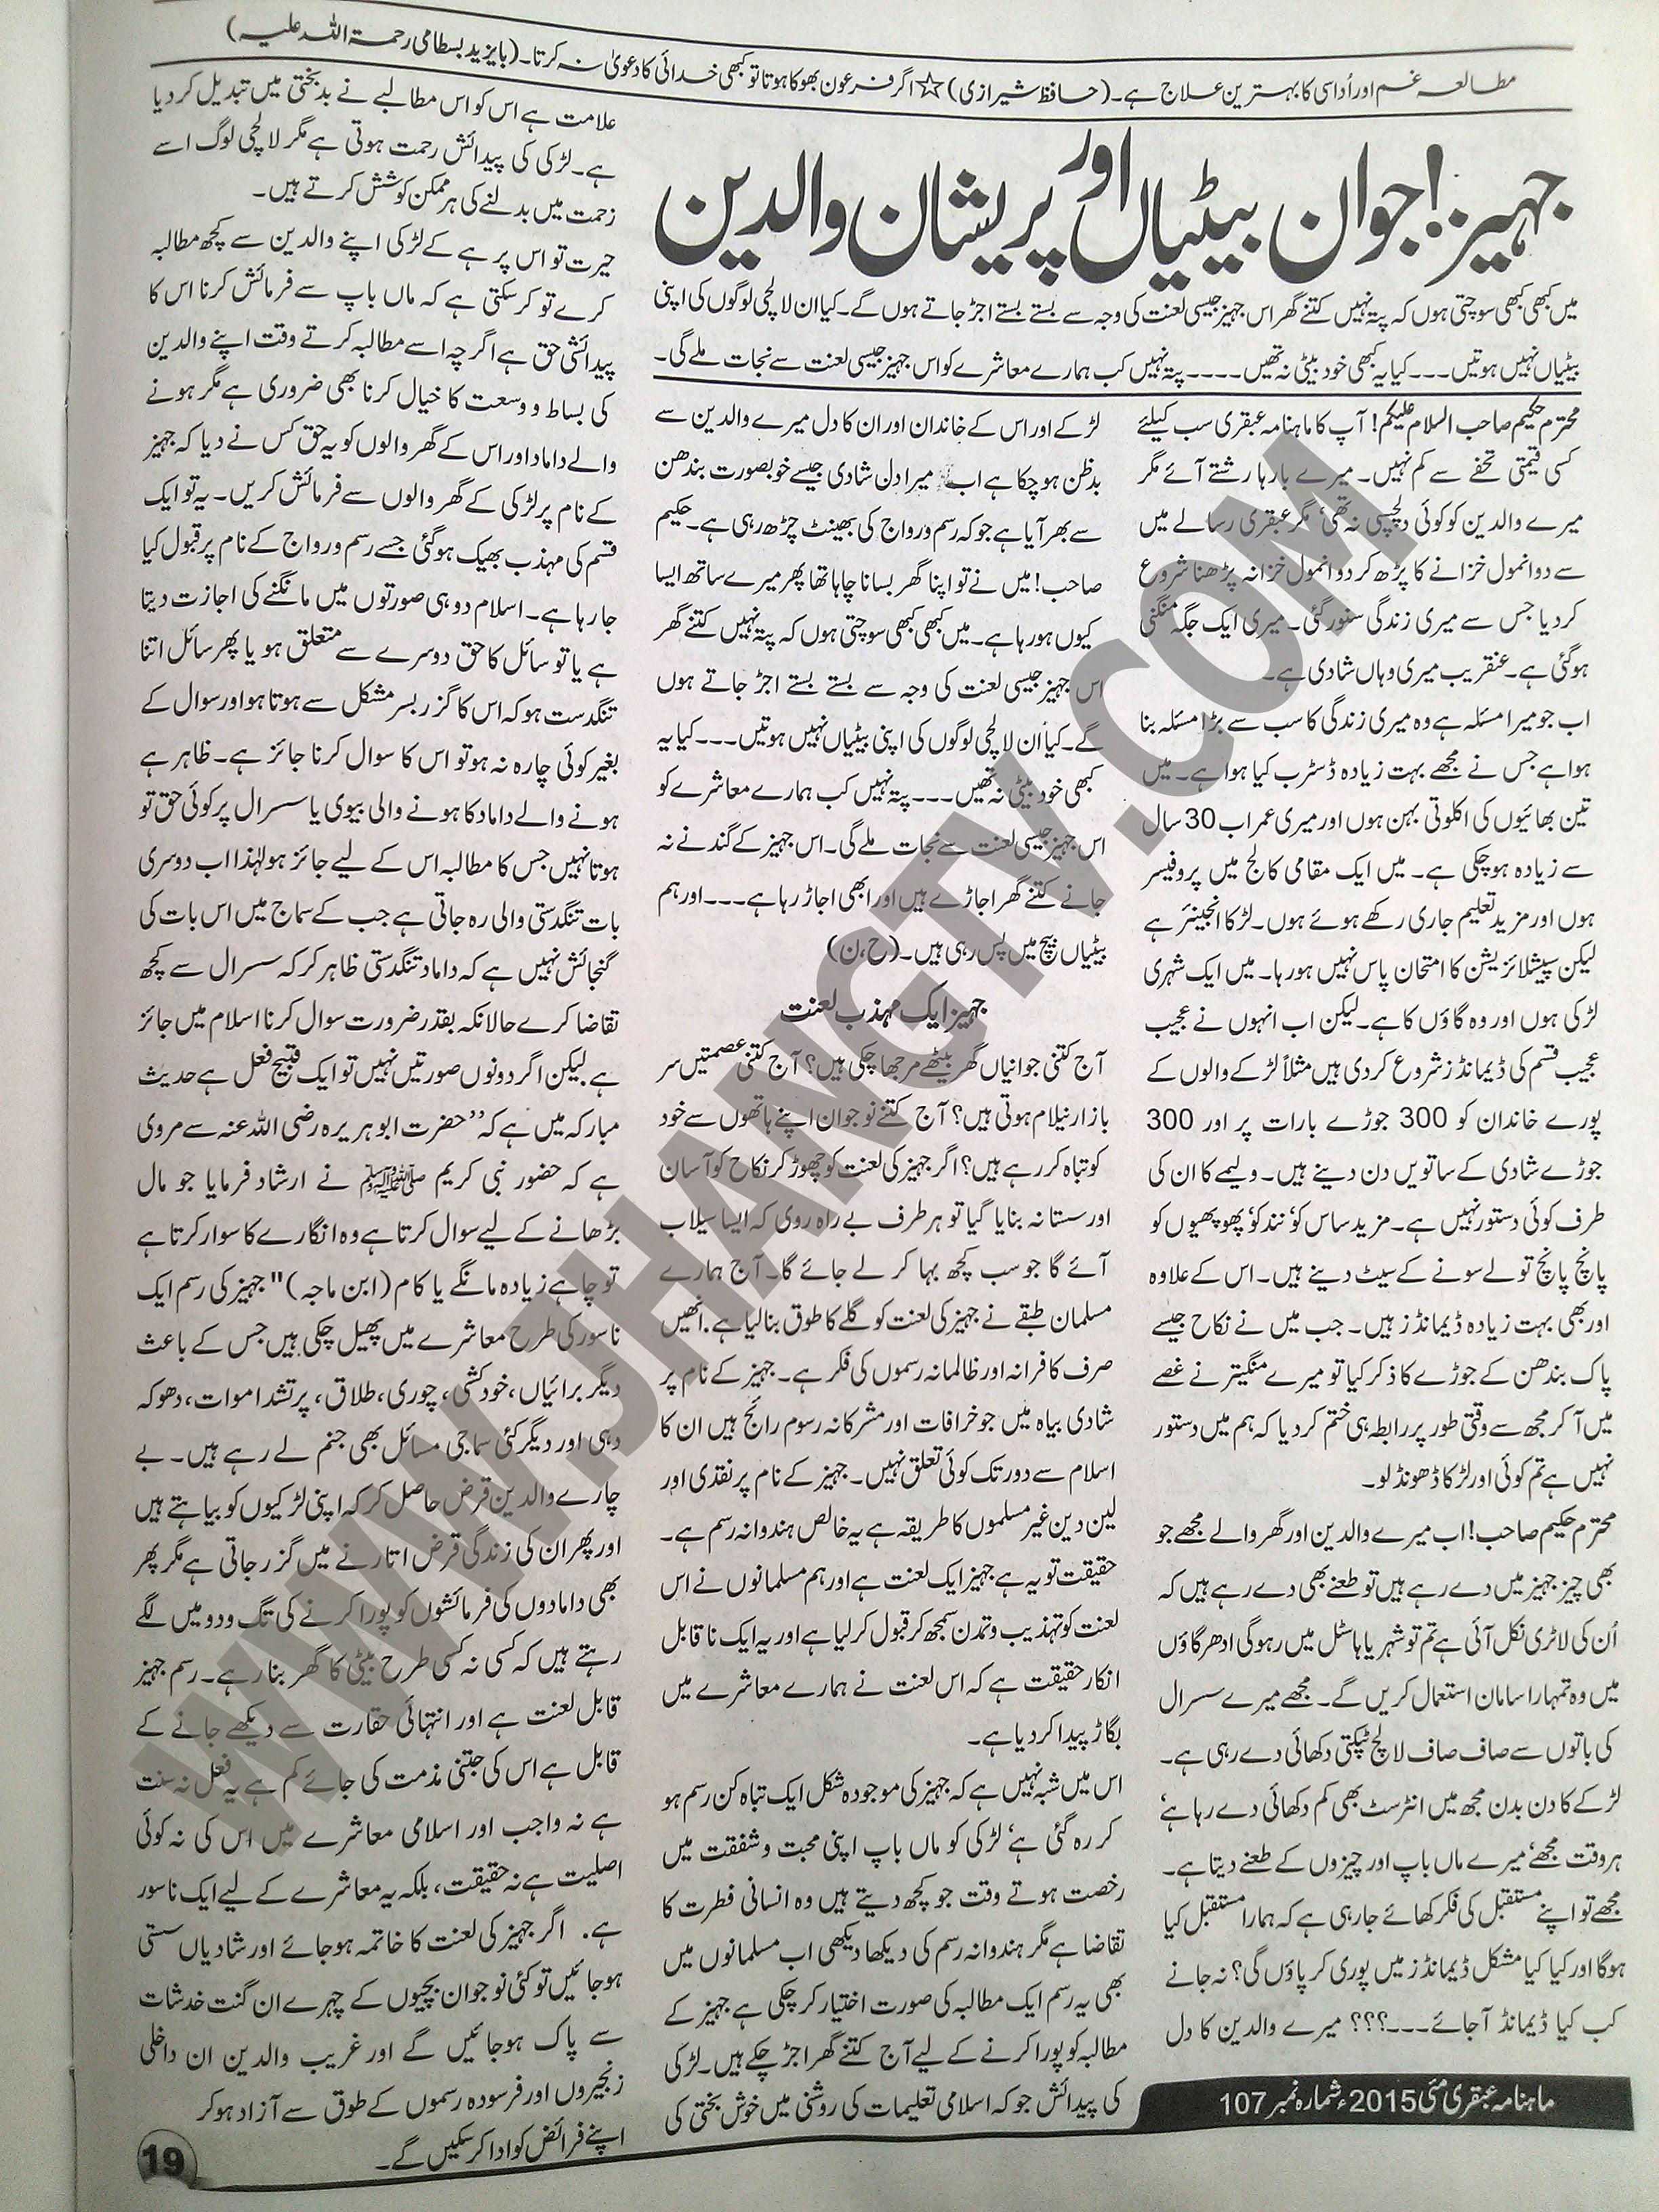 Ubqari May 2015 (17)